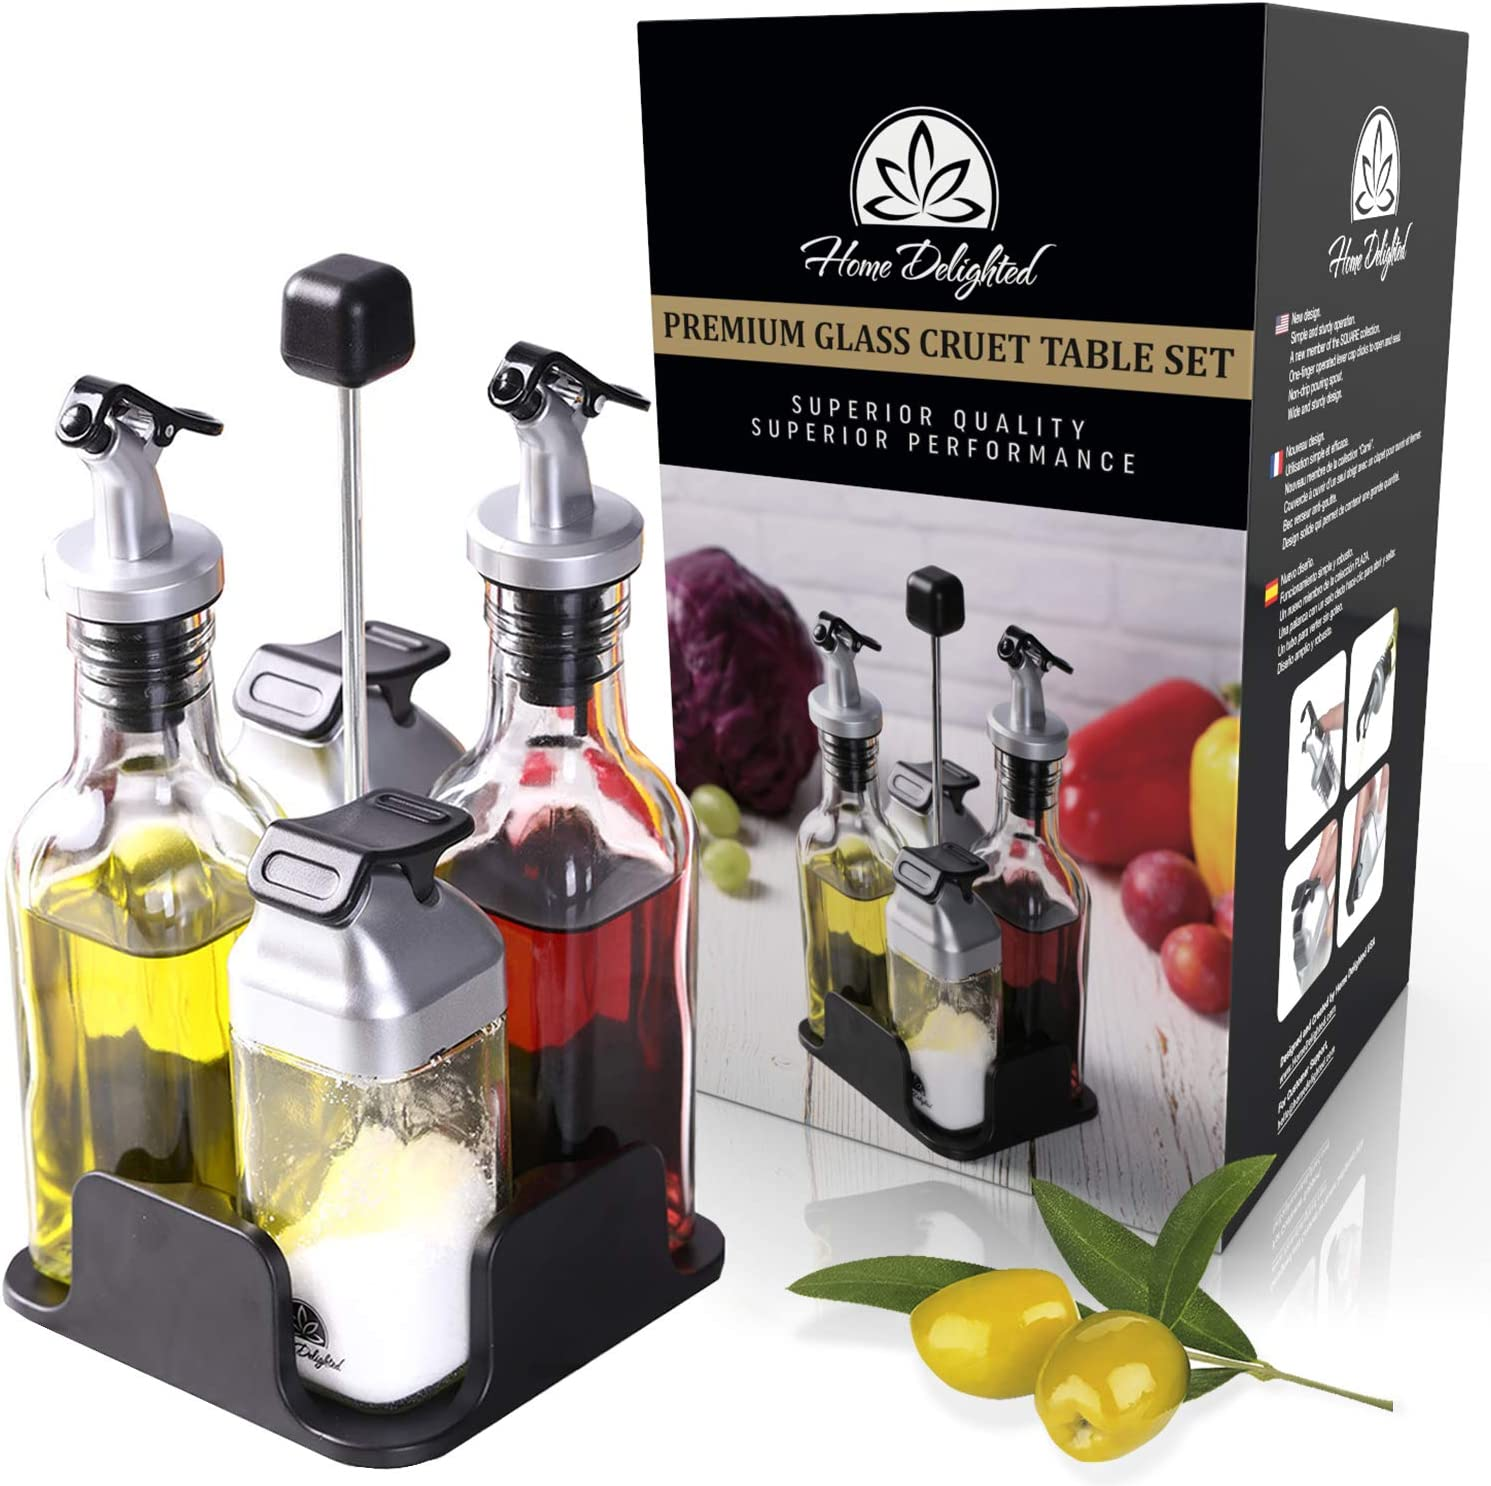 olive oil cruet handmade gift housewarming gift 9th anniversary gift oil and vinegar cruet cooking gifts oil and vinegar bottle